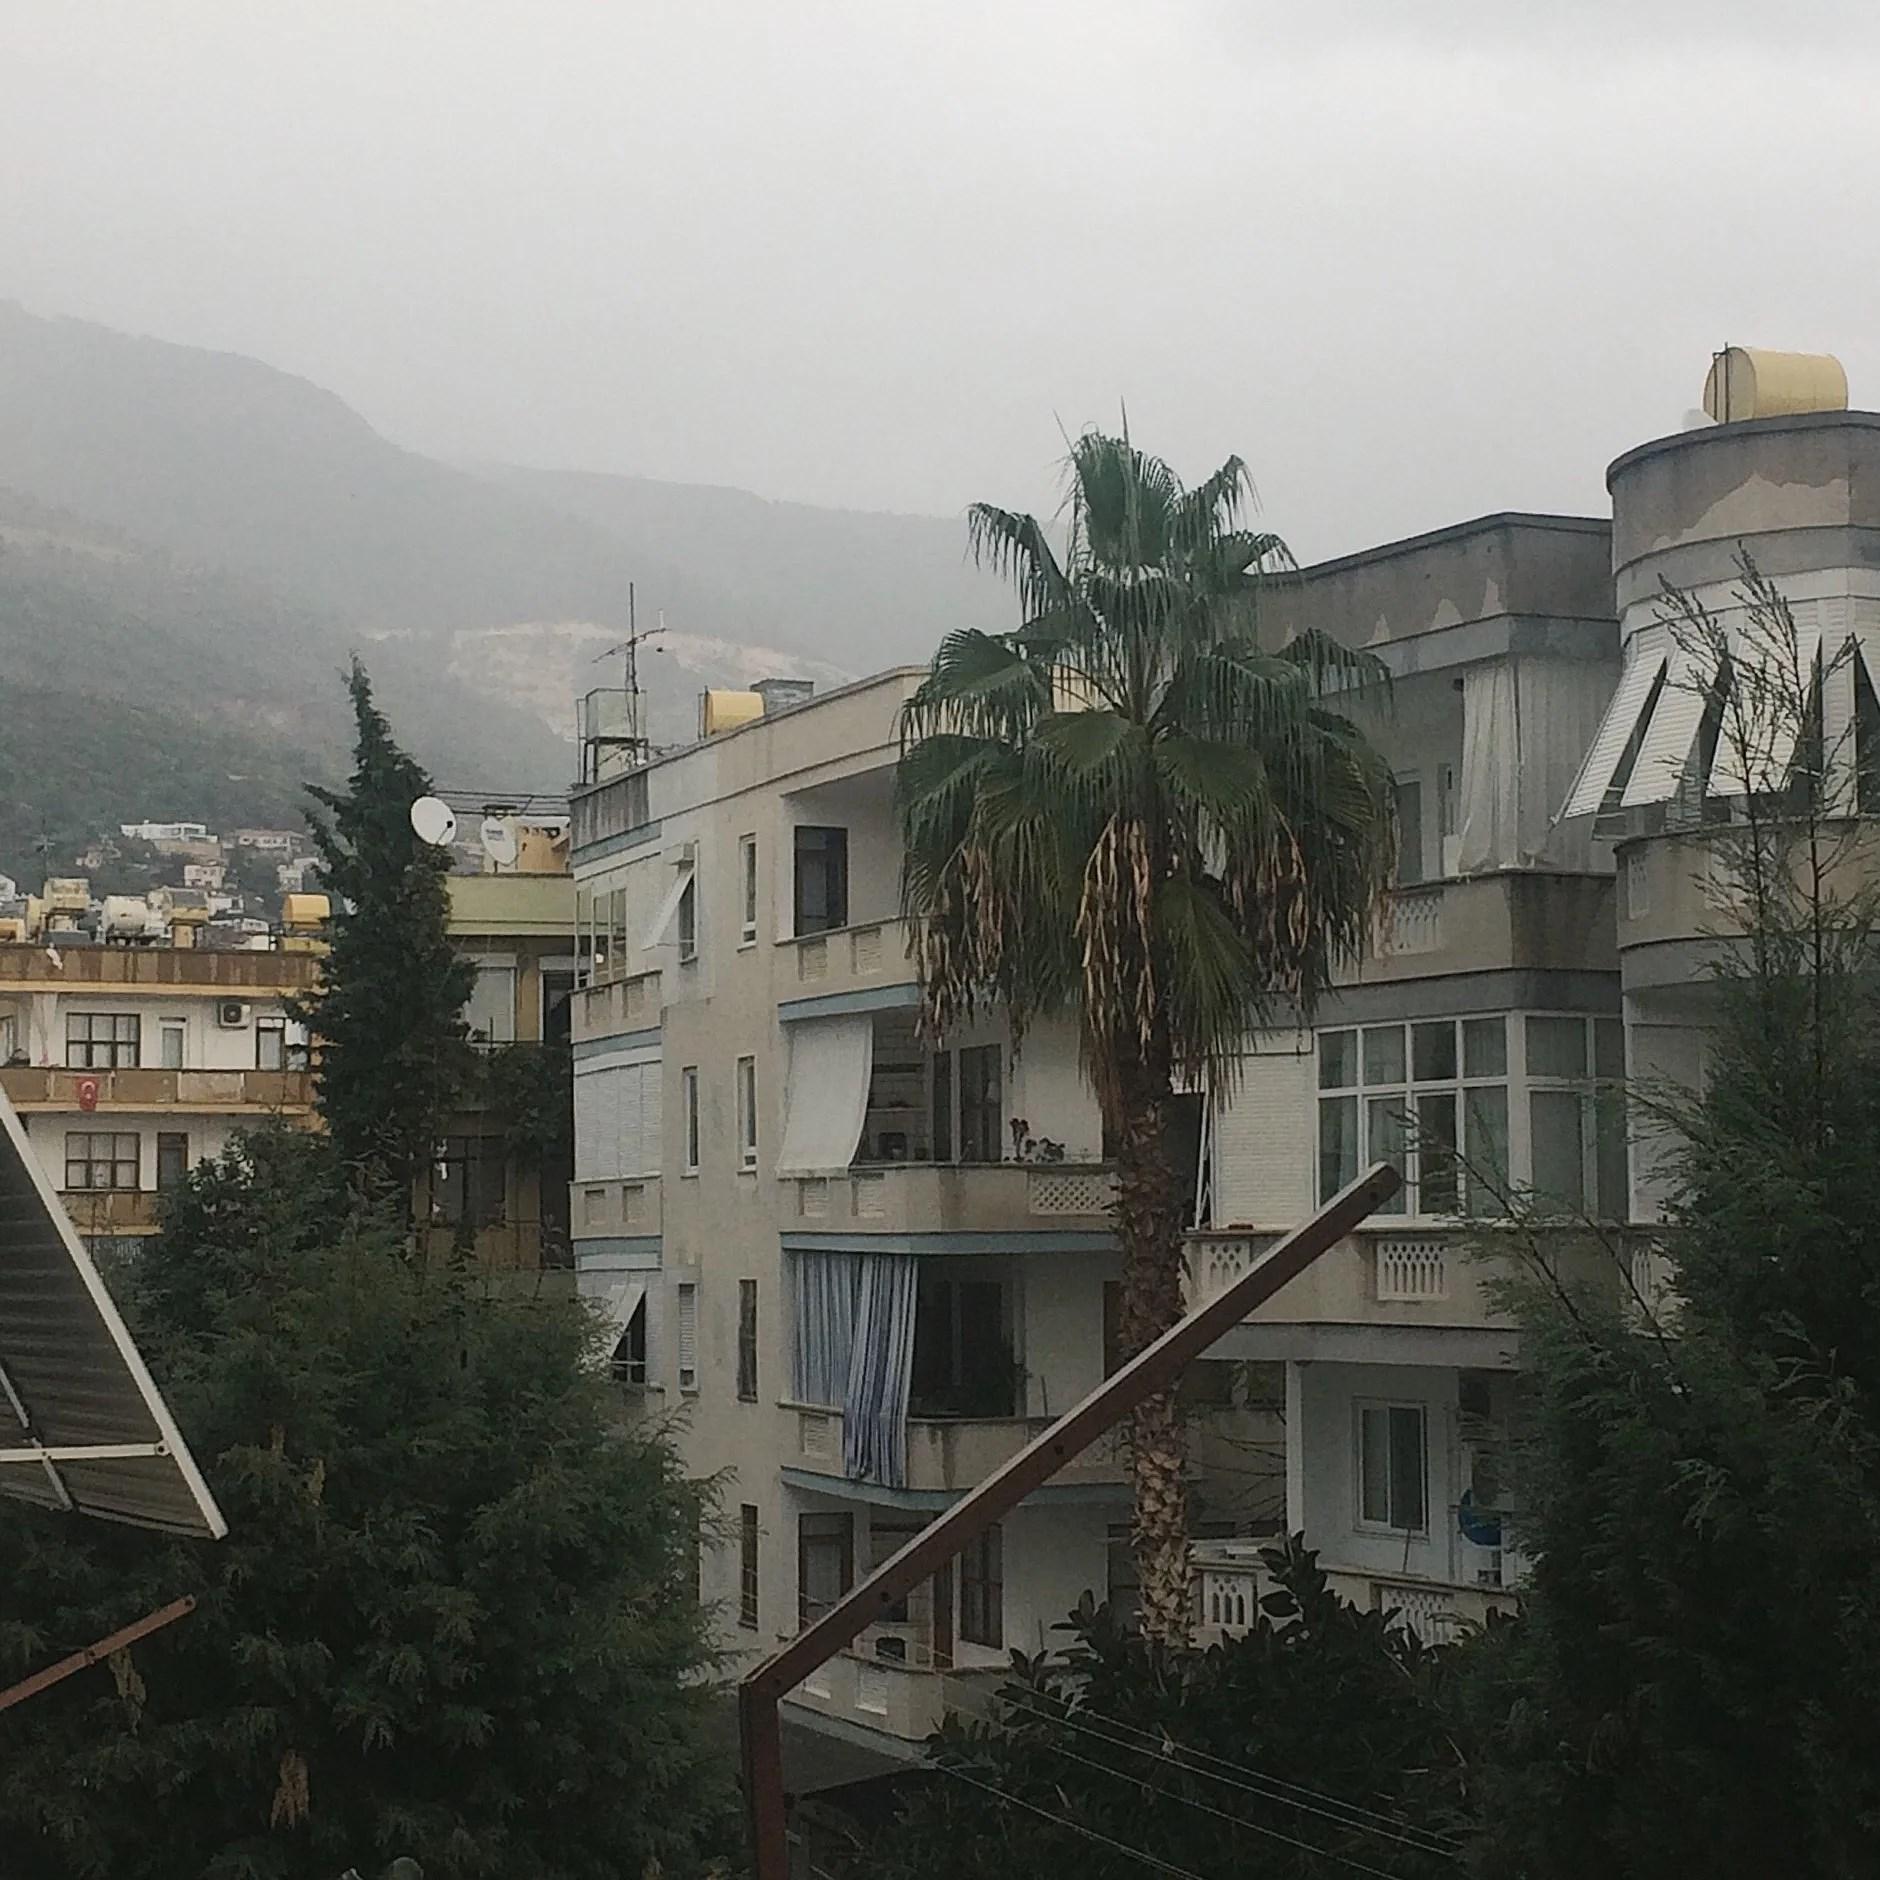 Let it rain, let it rain, let it rain